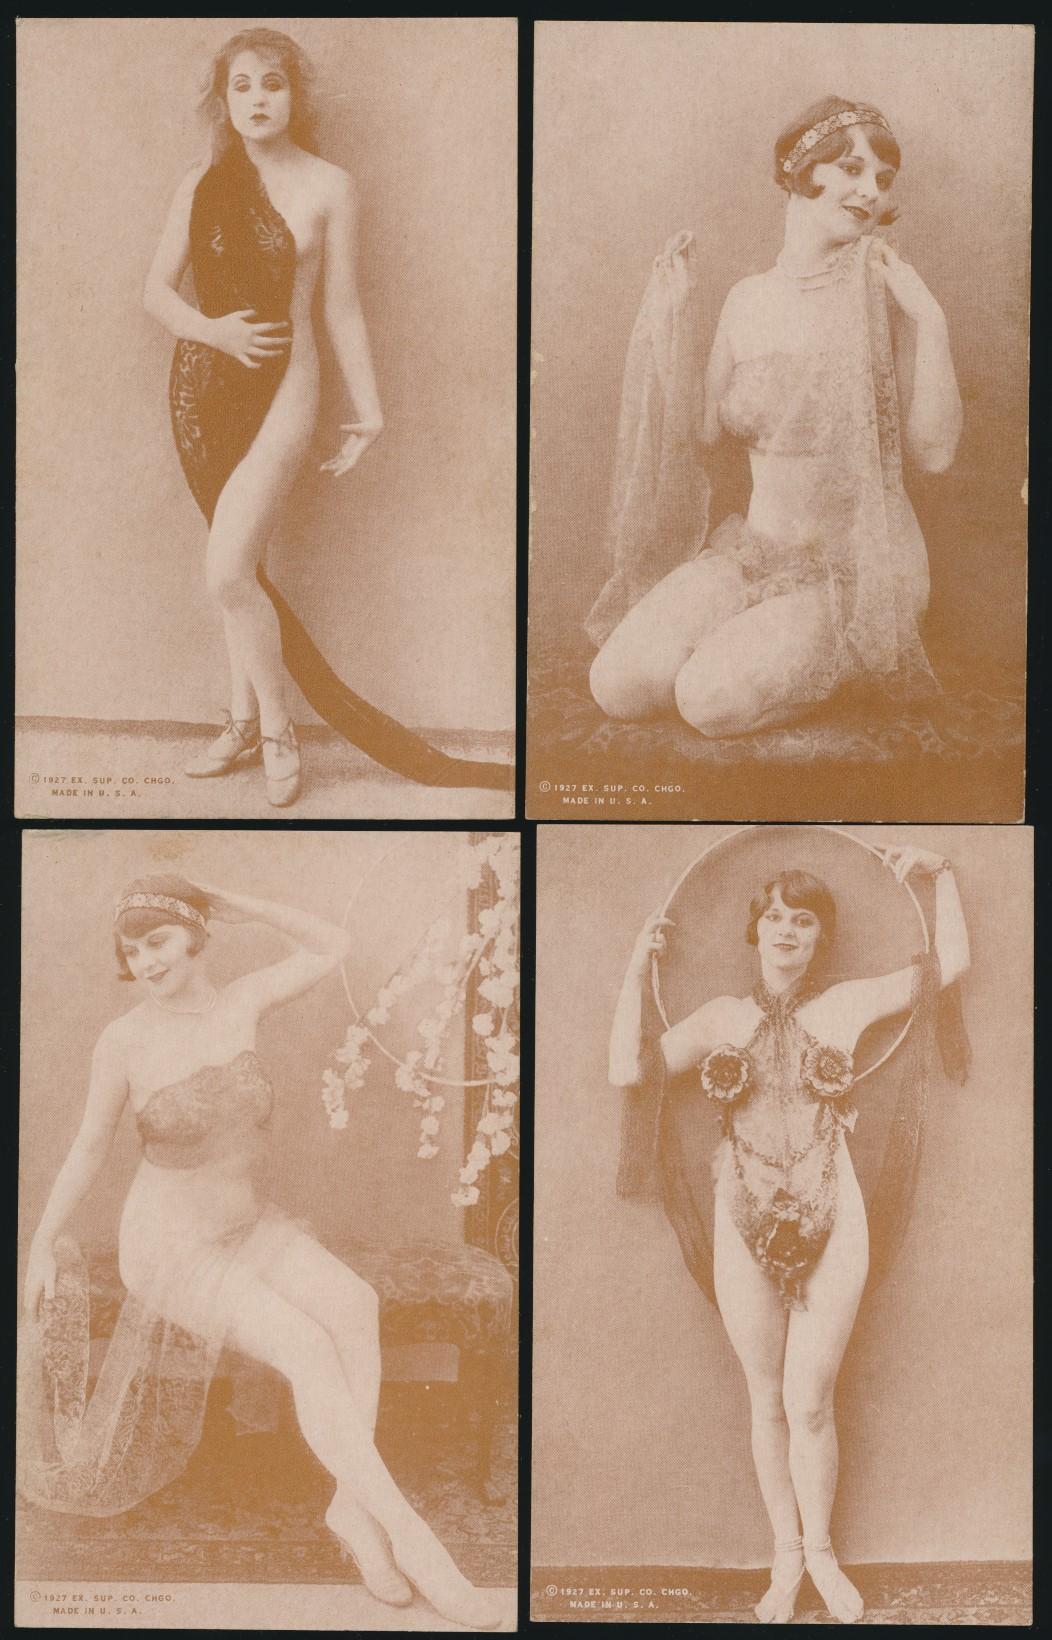 [exhibitgirls1927]